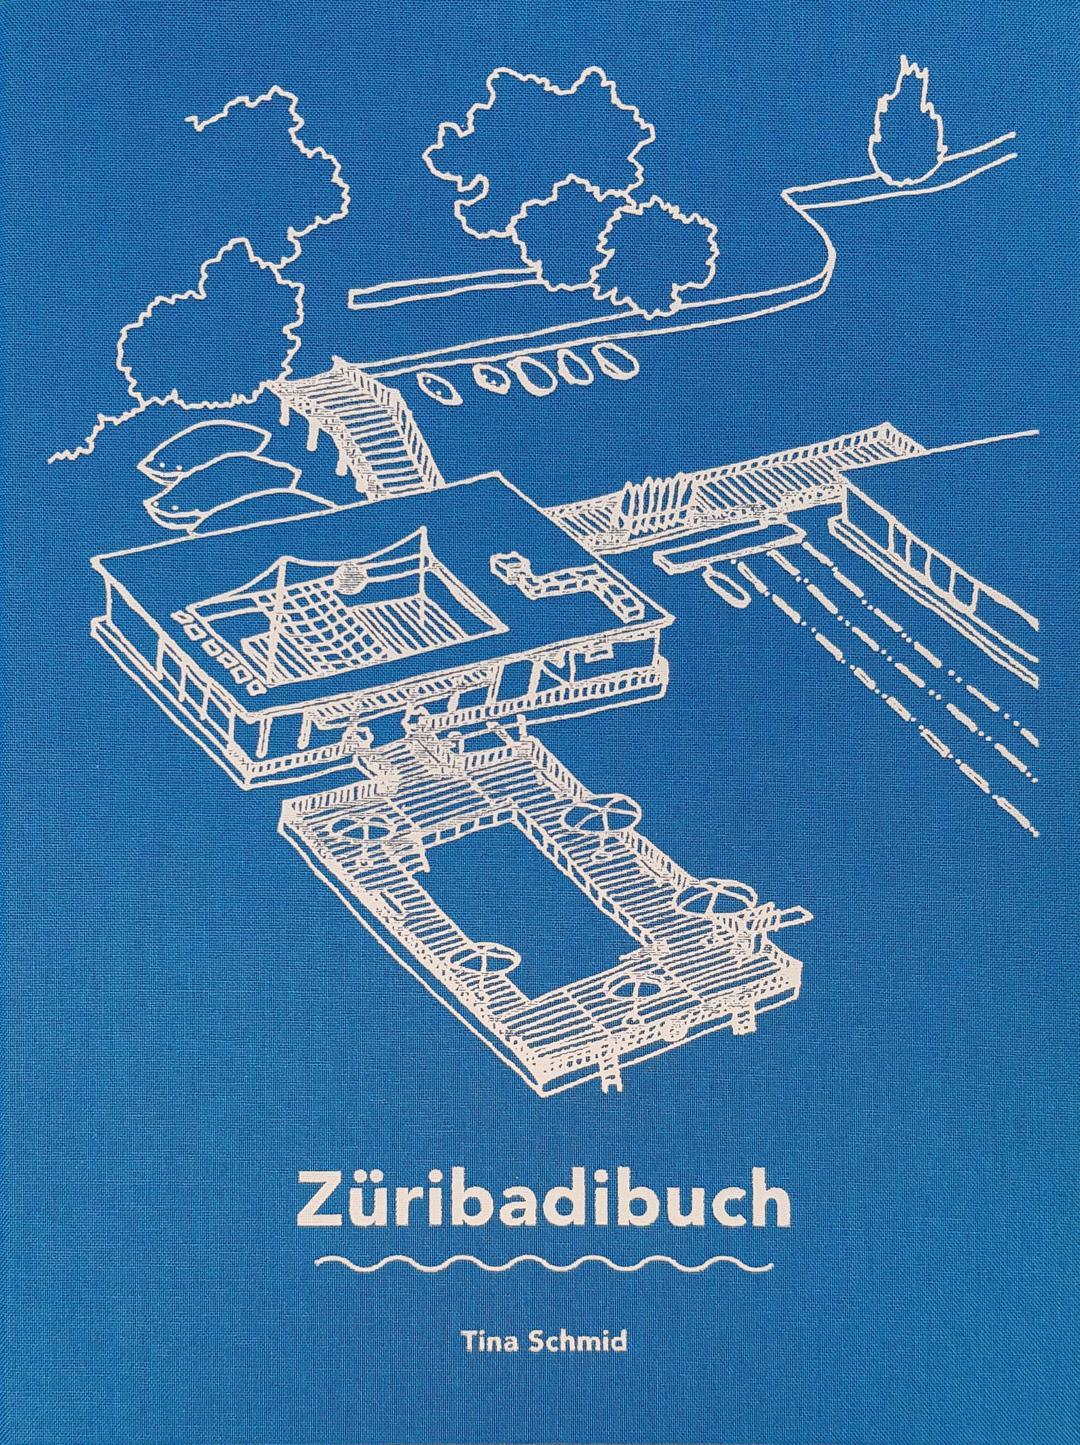 «Züribadibuch» von Tina Schmid, Zürich 2019, Signatur: 2019 B 10768